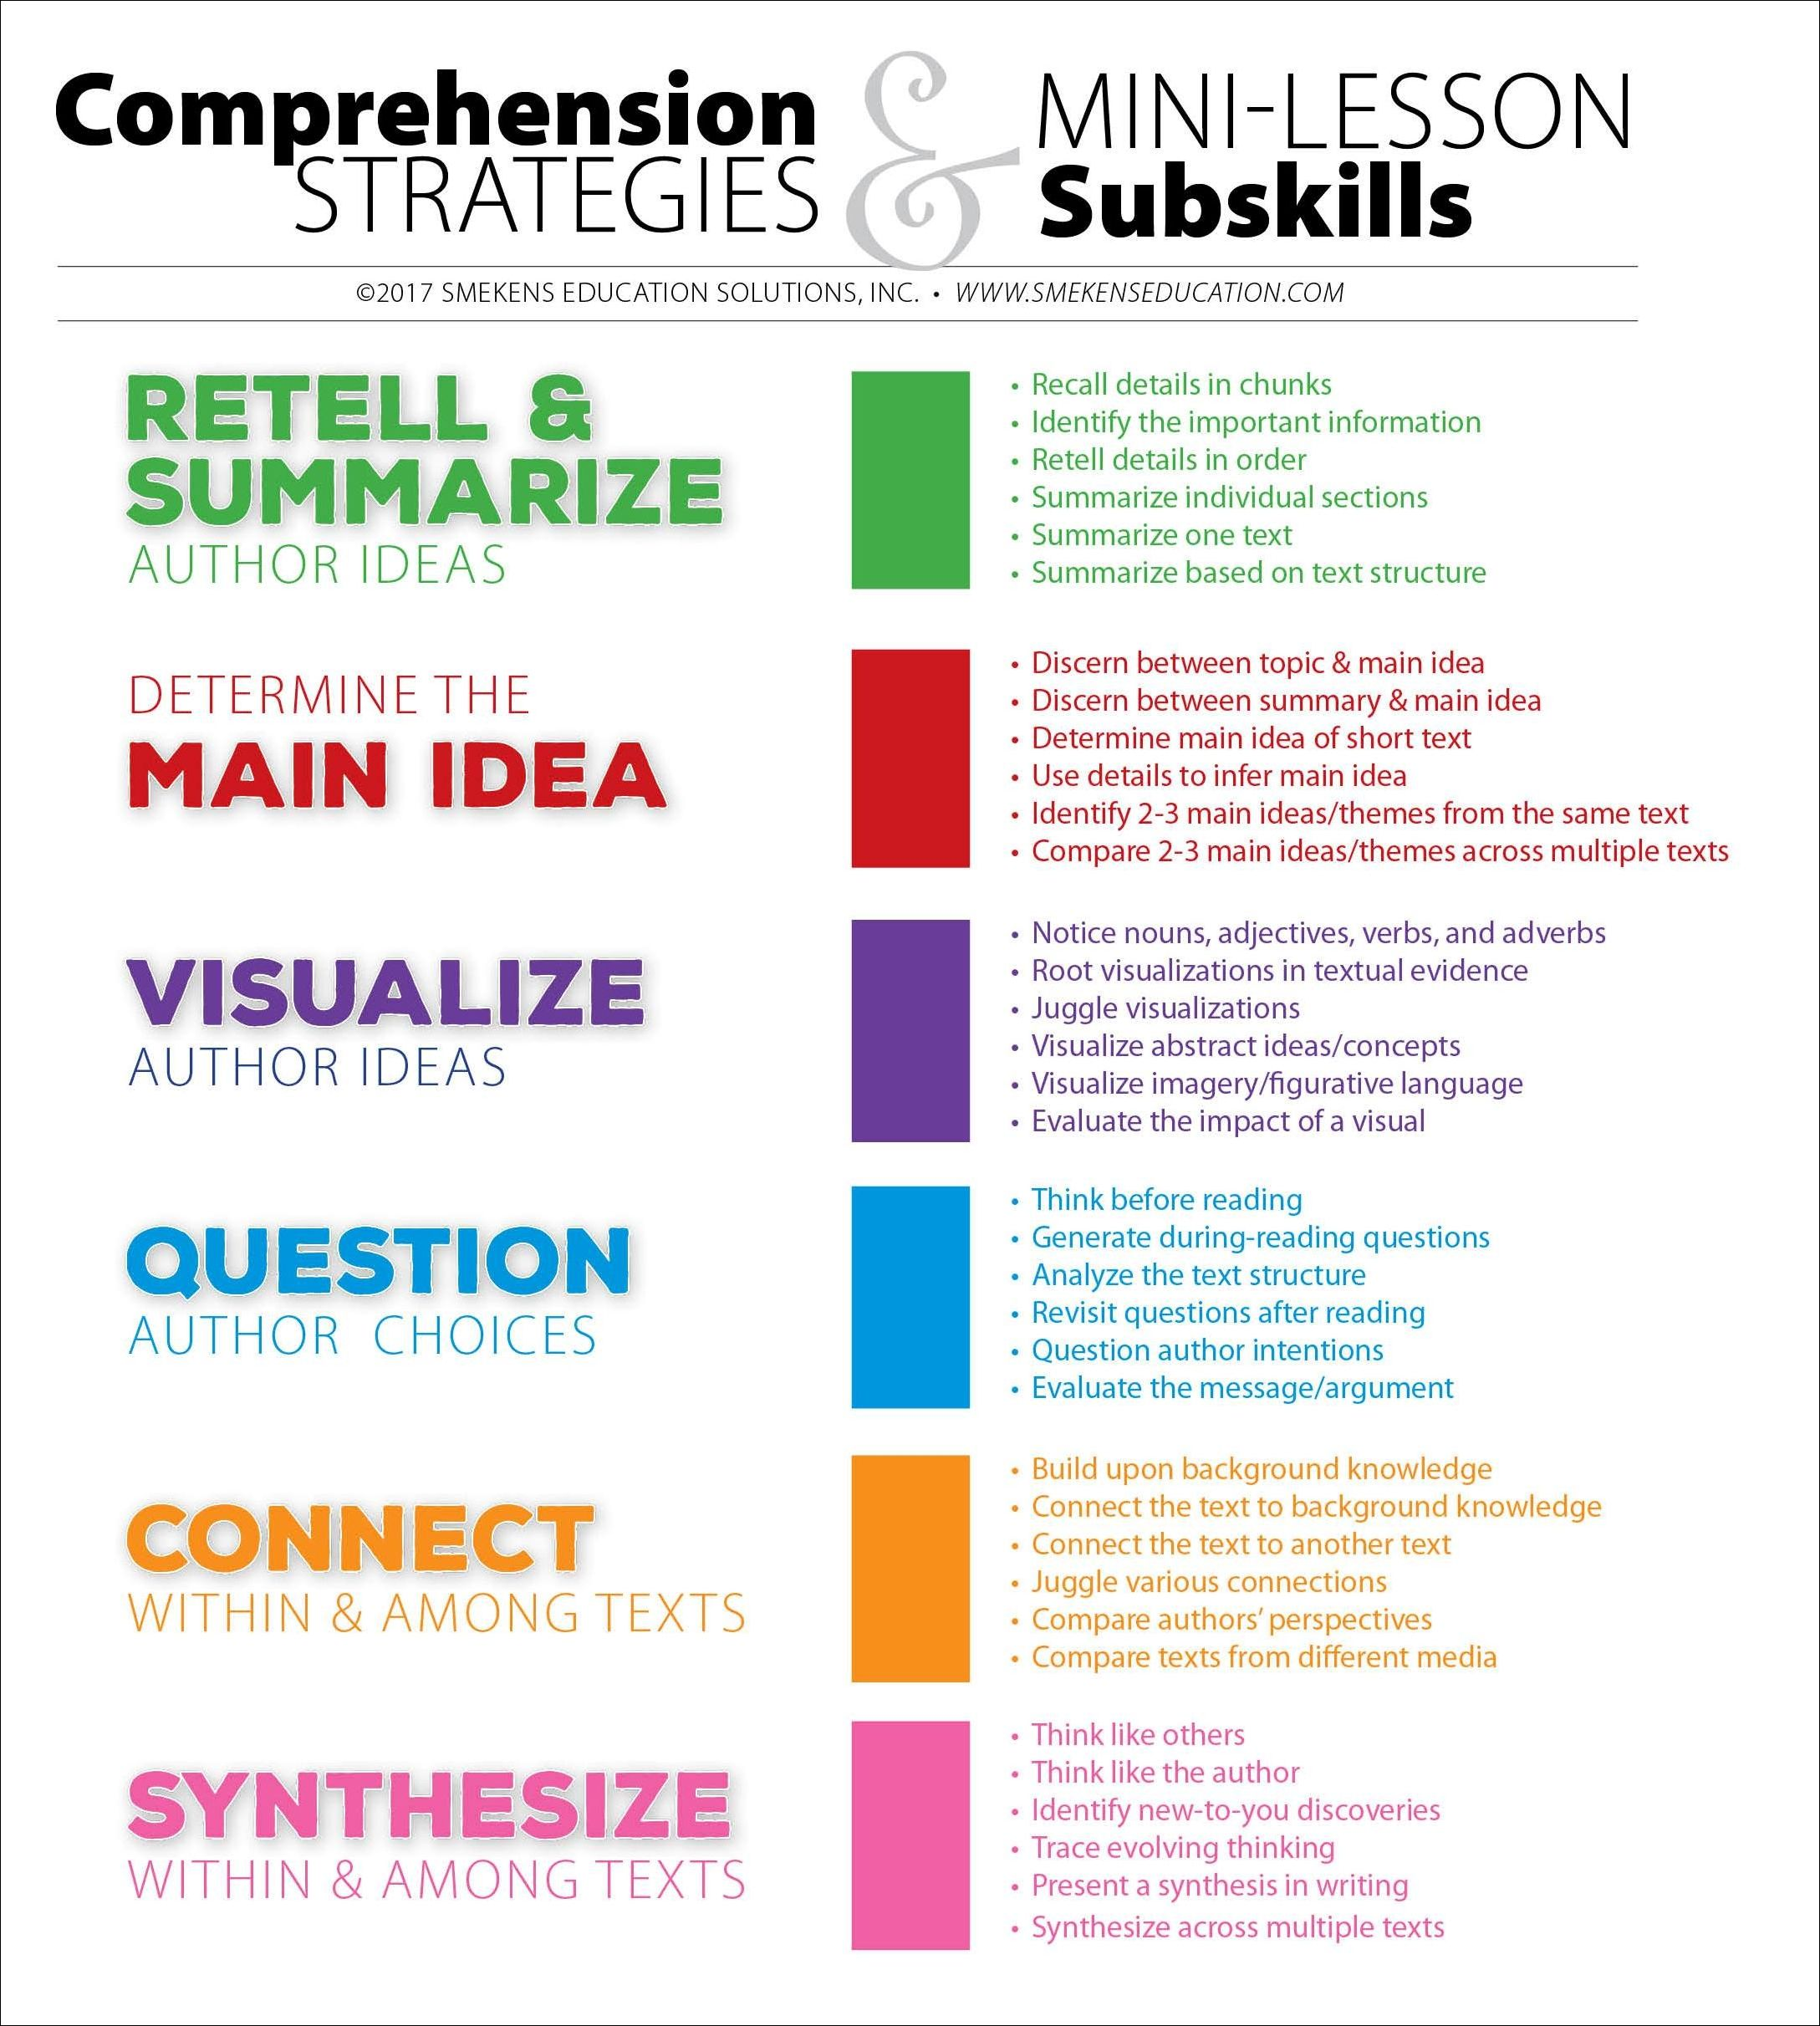 Comprehension Strategies Amp Mini Lesson Subskills